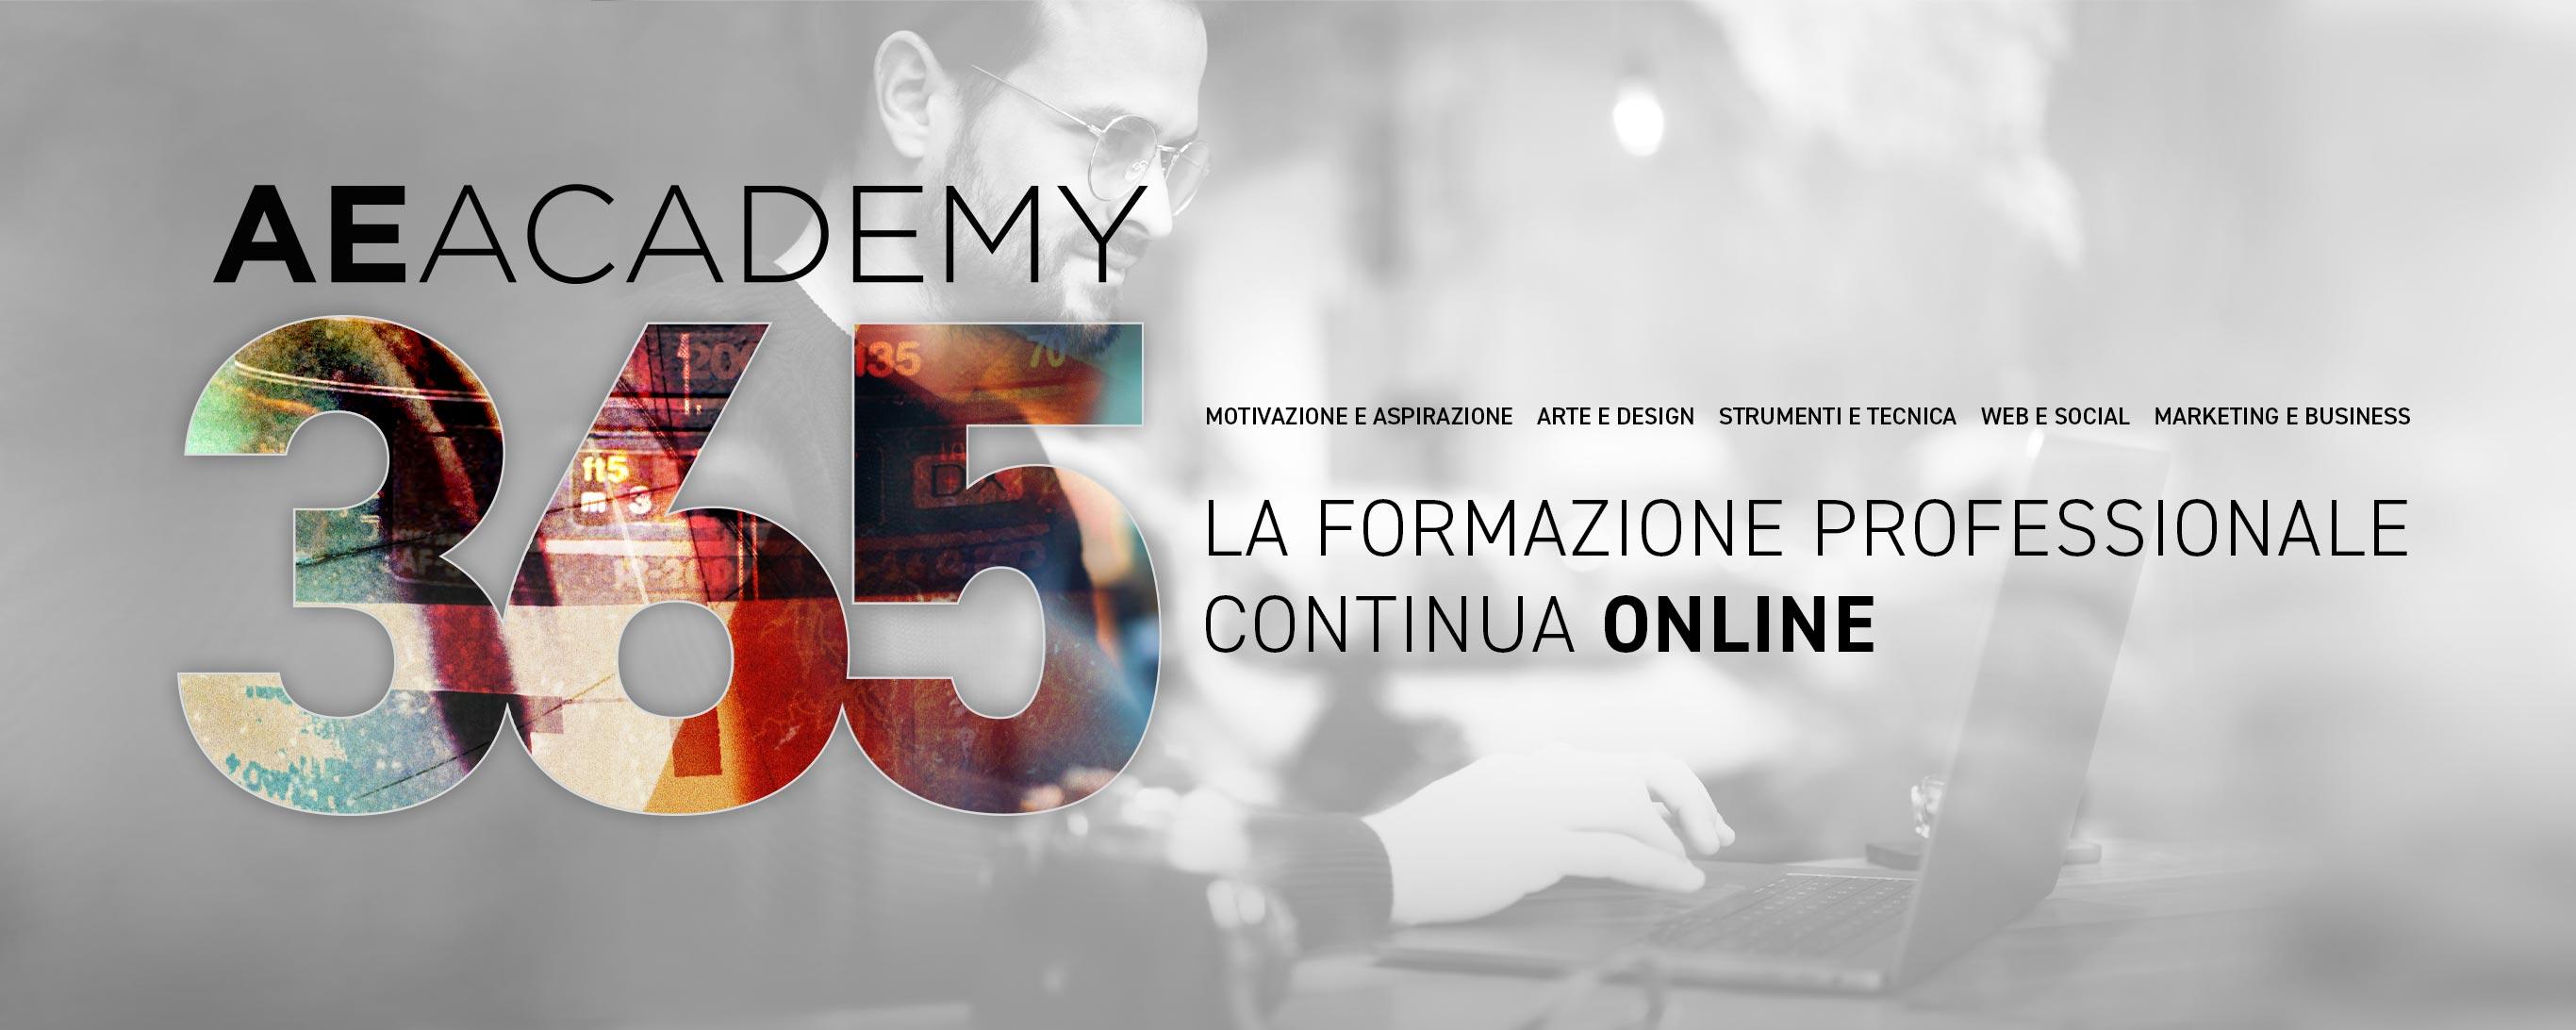 00_BN-Academy_Generico_2-1